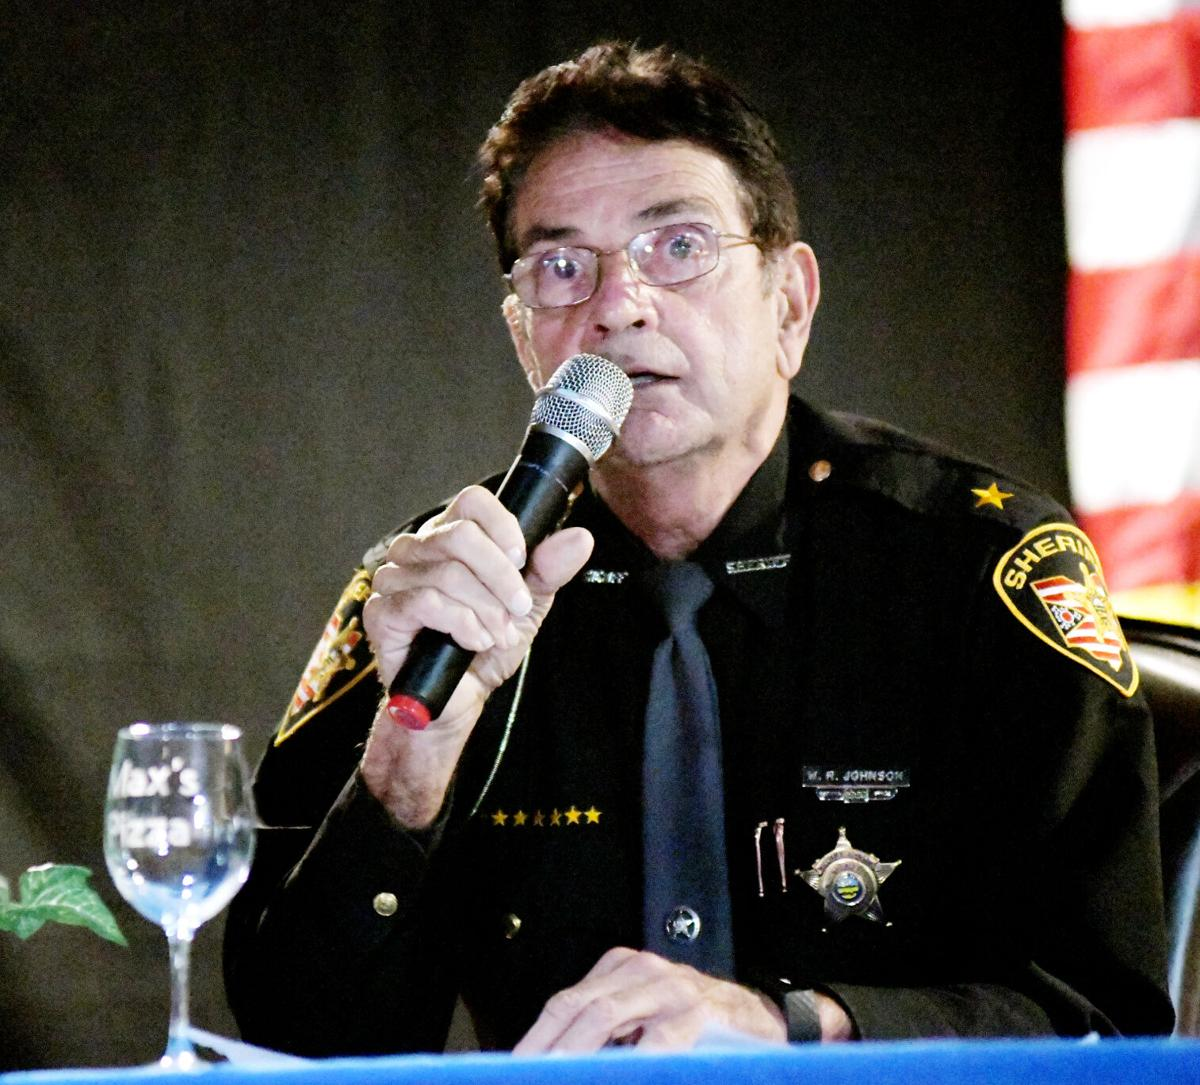 Ashtabula County Sheriff William Johnson